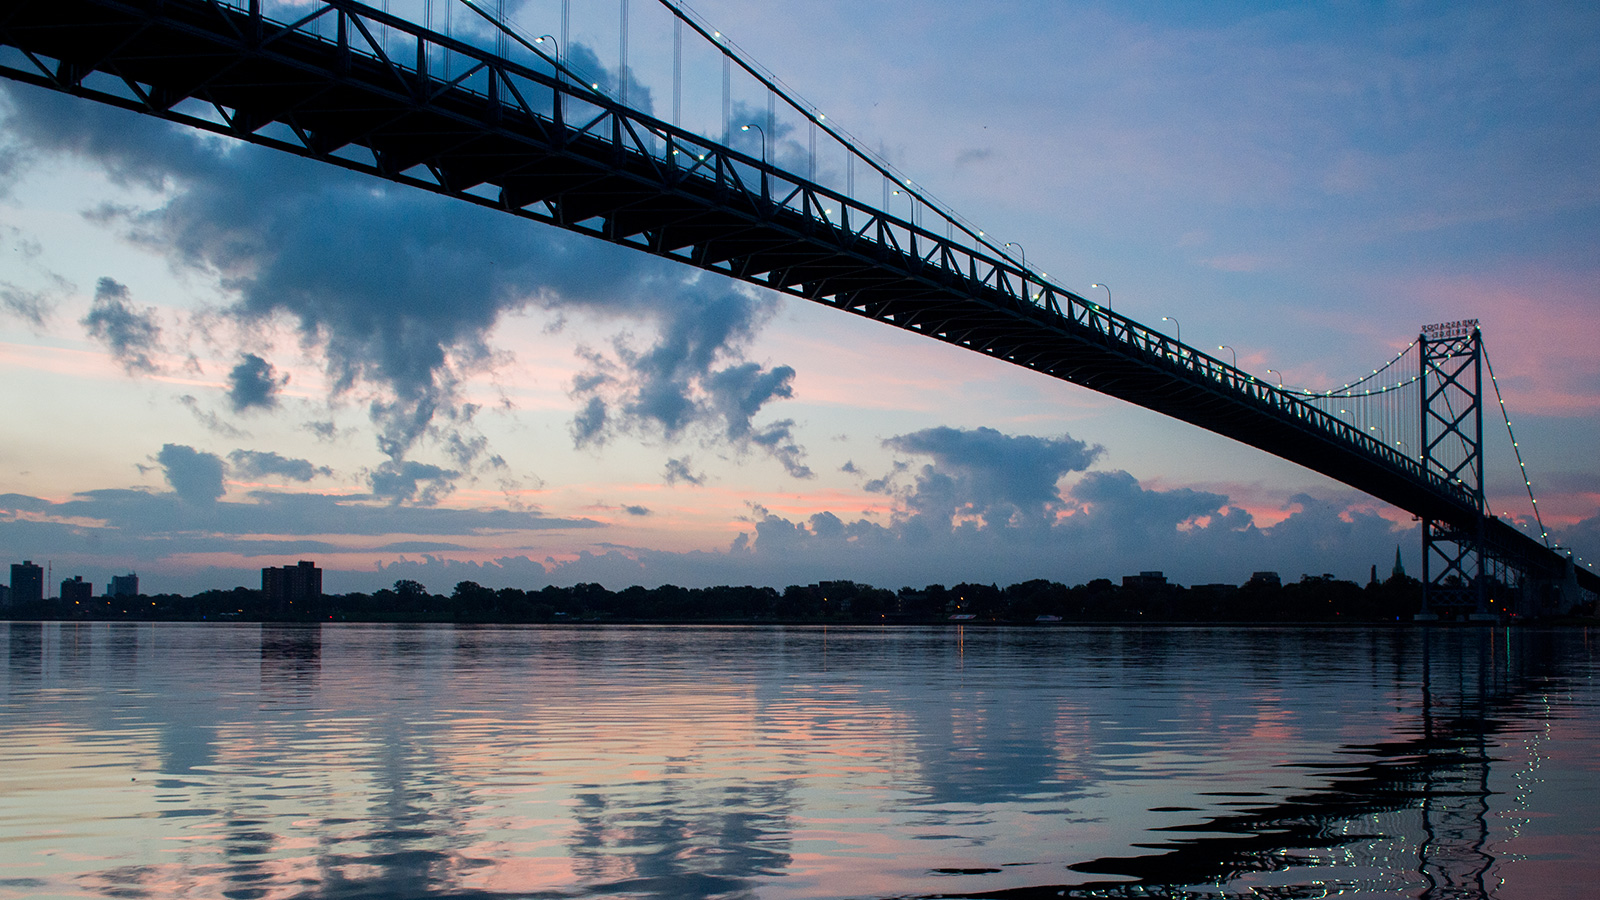 Niagara Falls Moving Wallpaper Built In 1929 The Ambassador Bridge That Joins Detroit